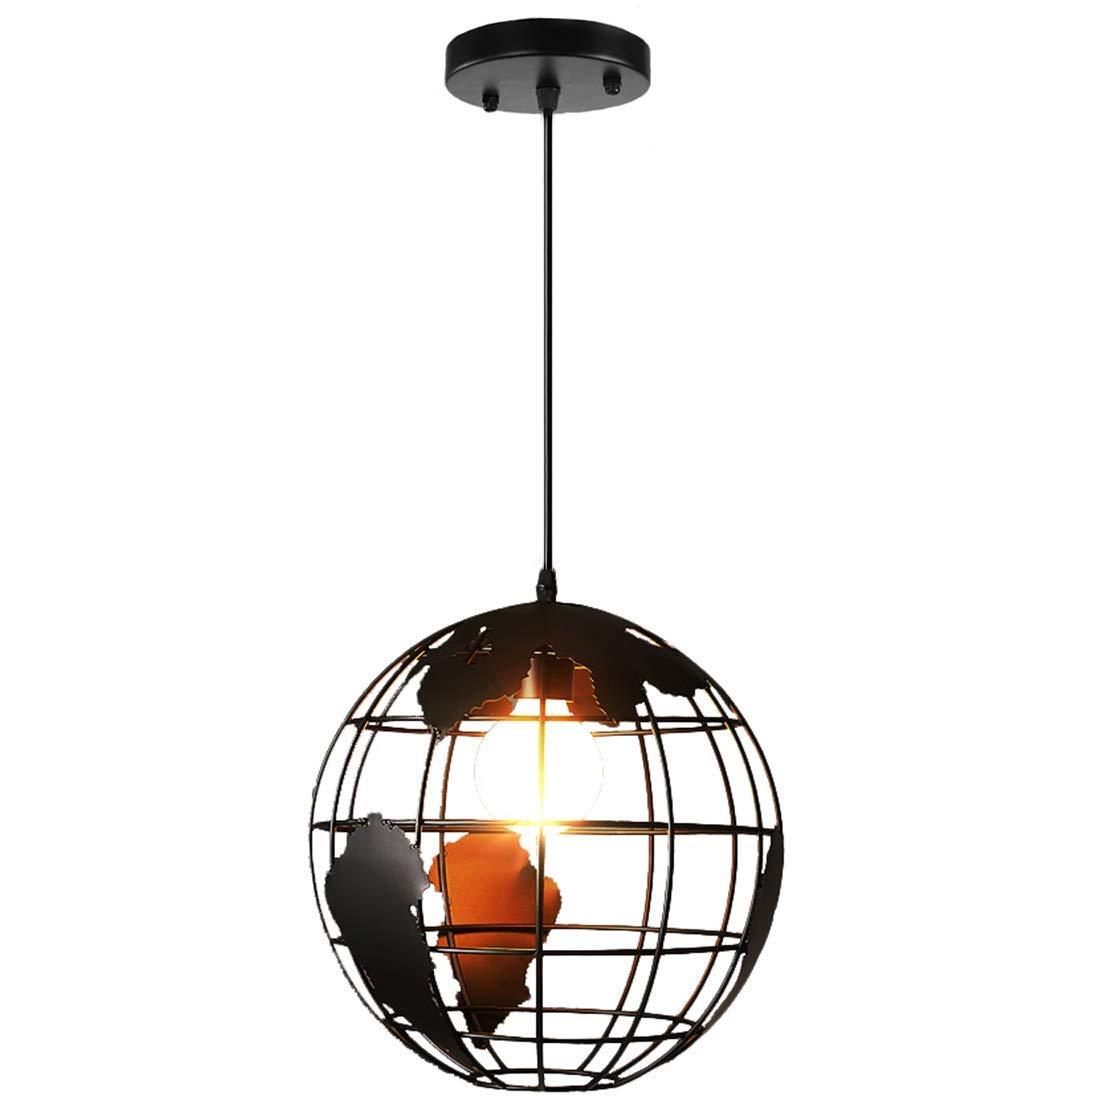 Pendant Lamp, iPstyle Modern Simple Creative Pendant Lights Globe Shape Office Bedroom Living Room Restaurant Pendant Lighting Restaurant Hotel Farmhouse Cafes, Hallway Decoration